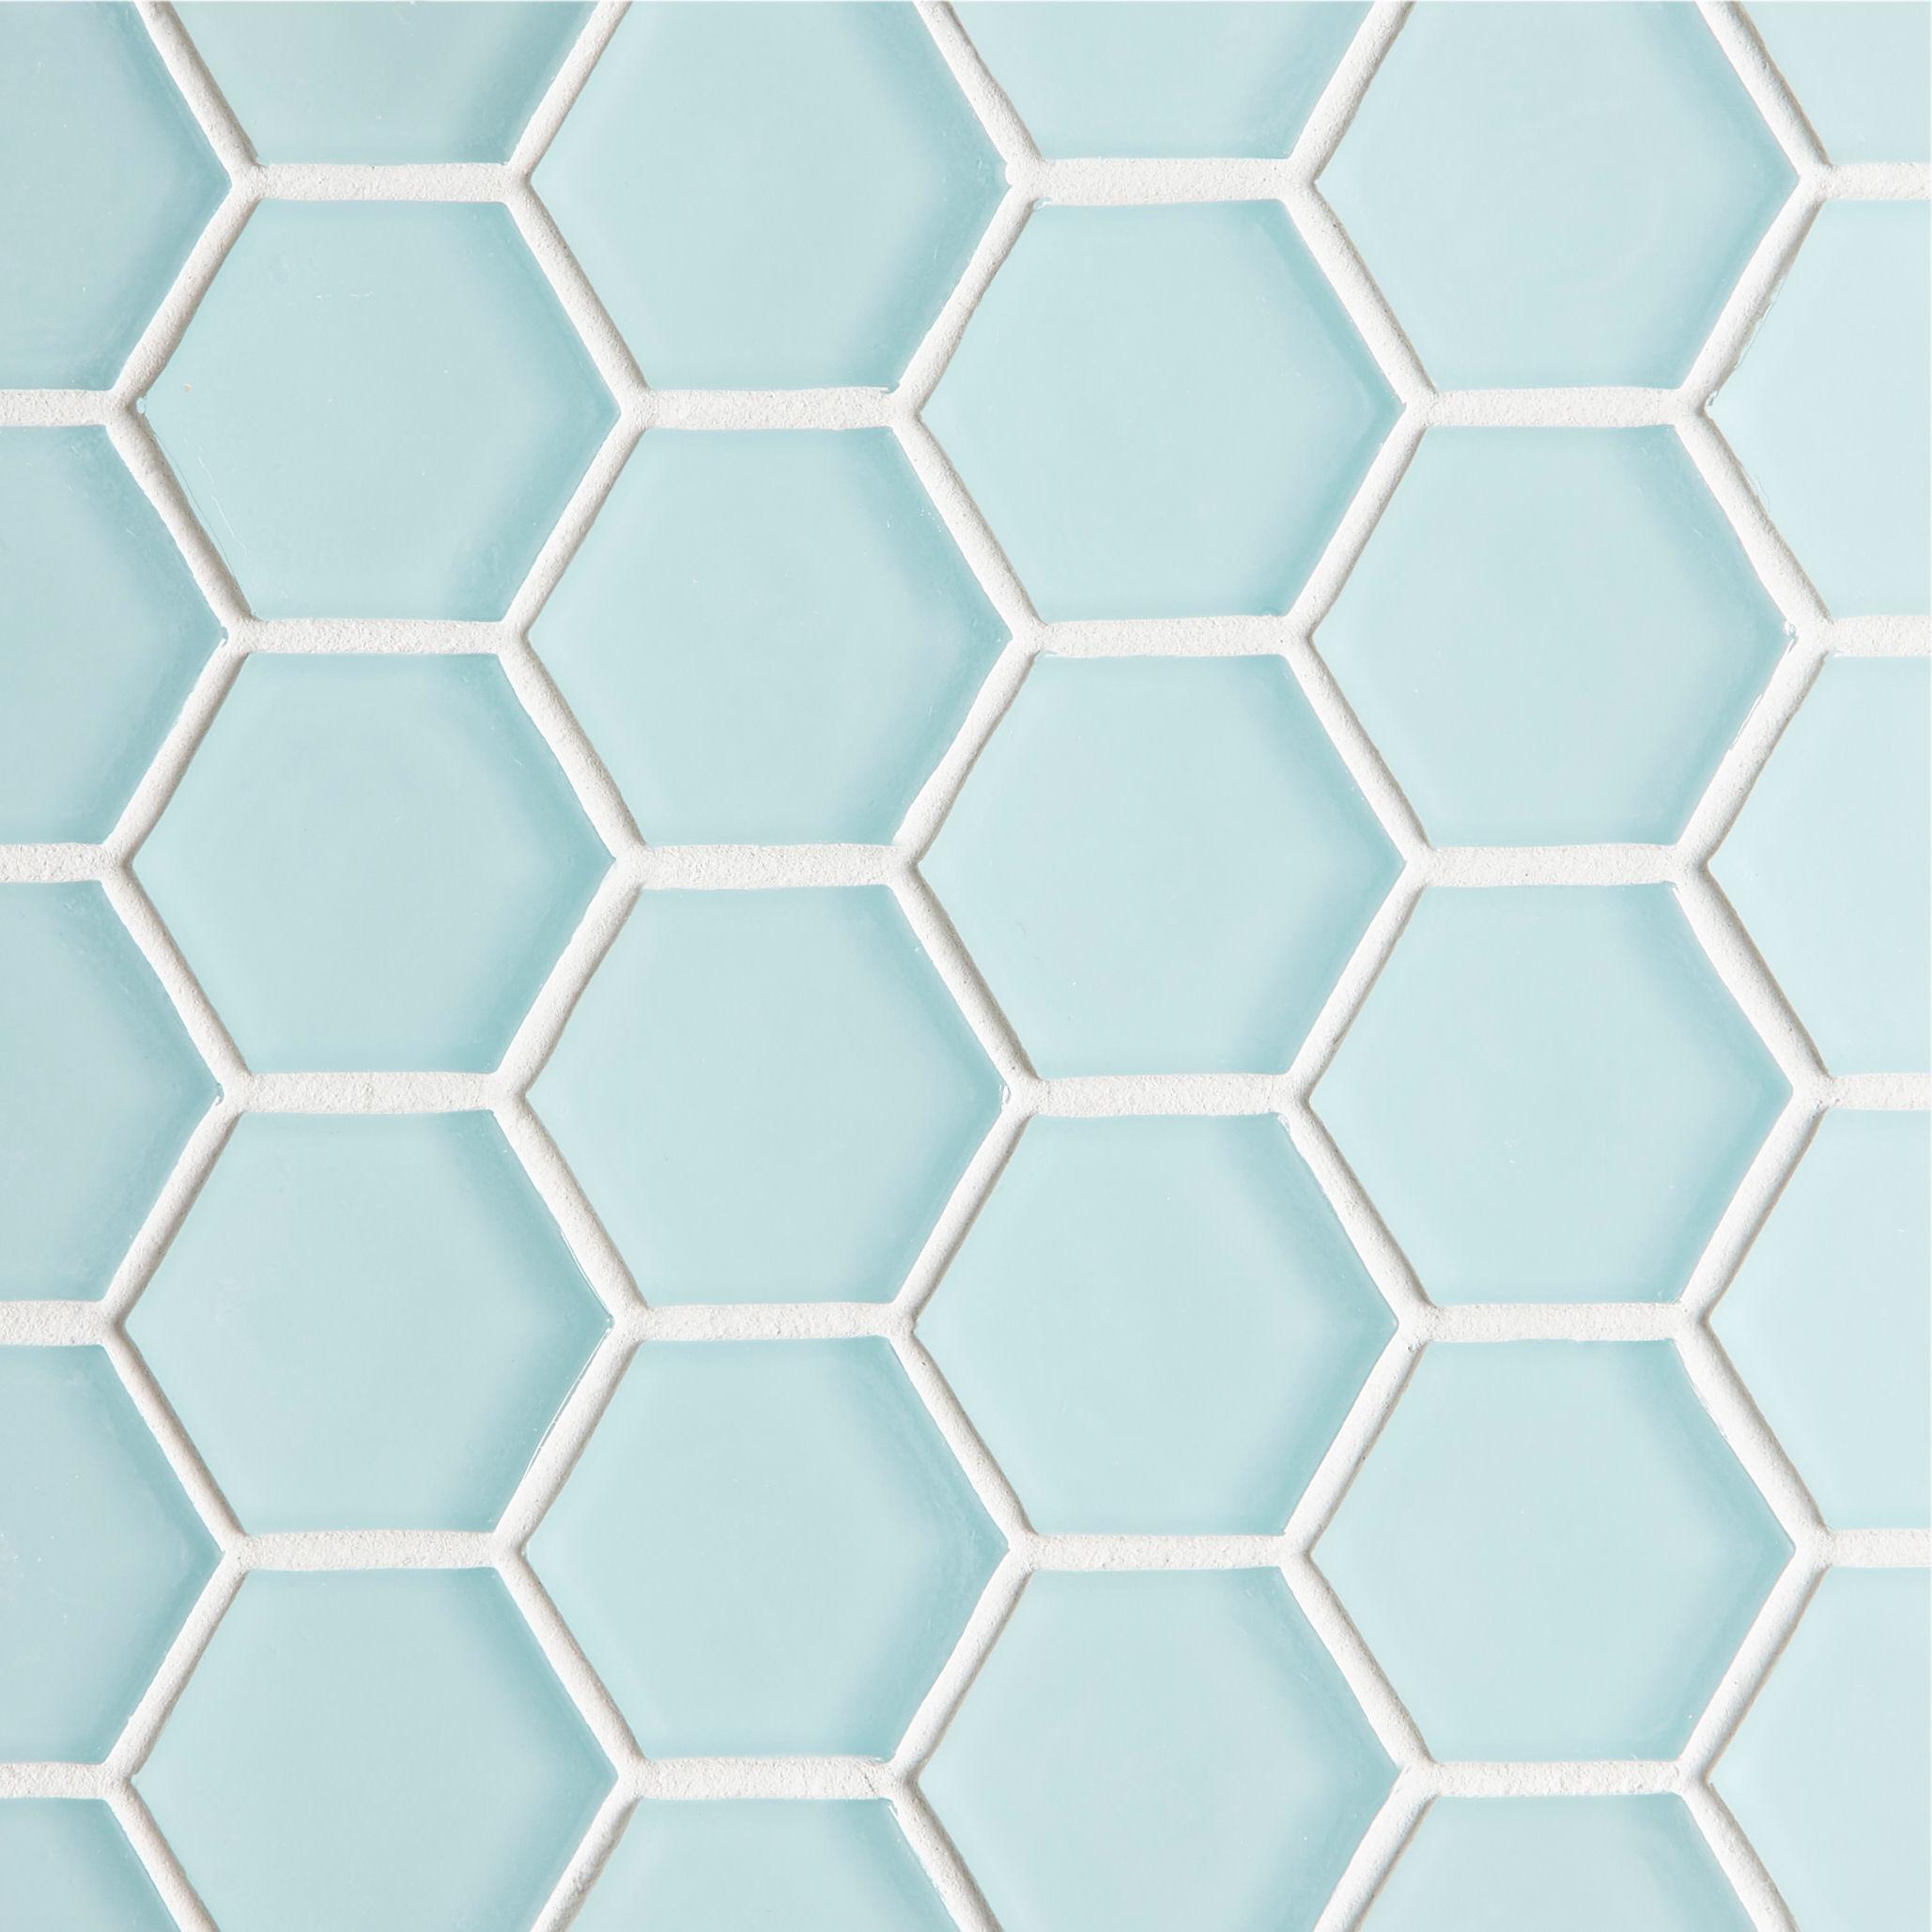 glacier blue glass hexagon mosaic tile mandarin stone